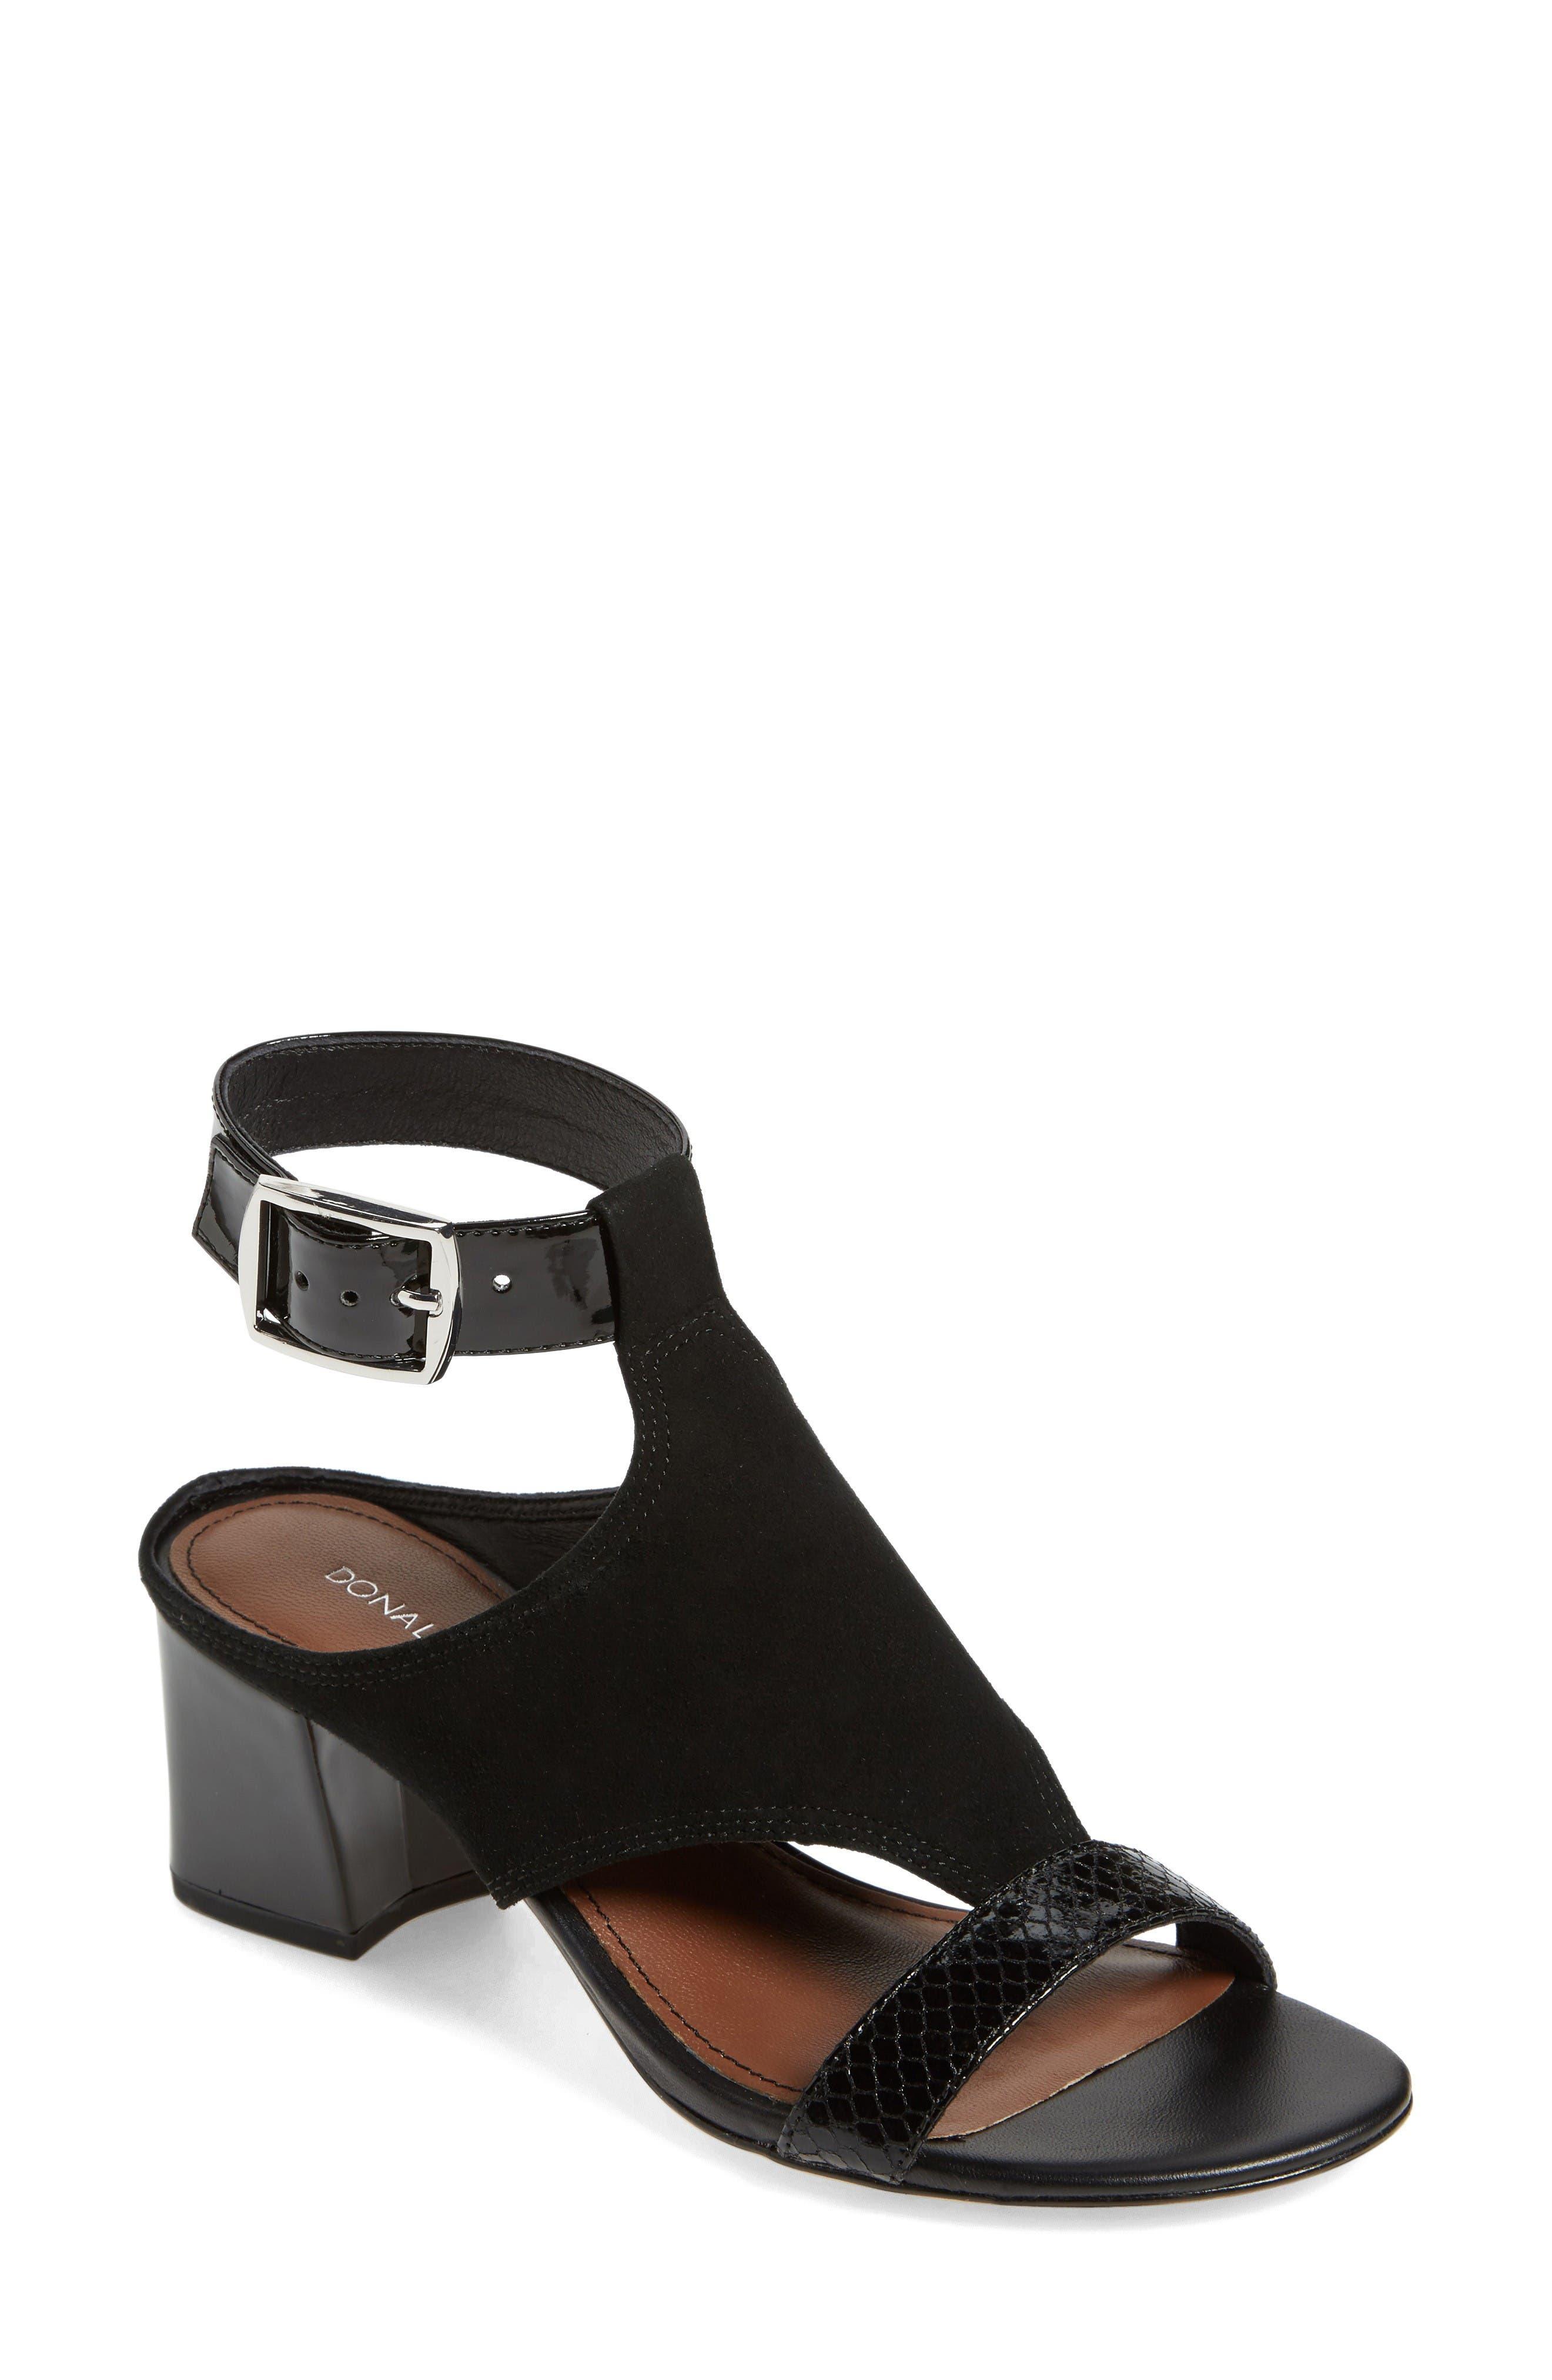 Alternate Image 1 Selected - Donald J Pliner Ellee Block Heel Sandal (Women)